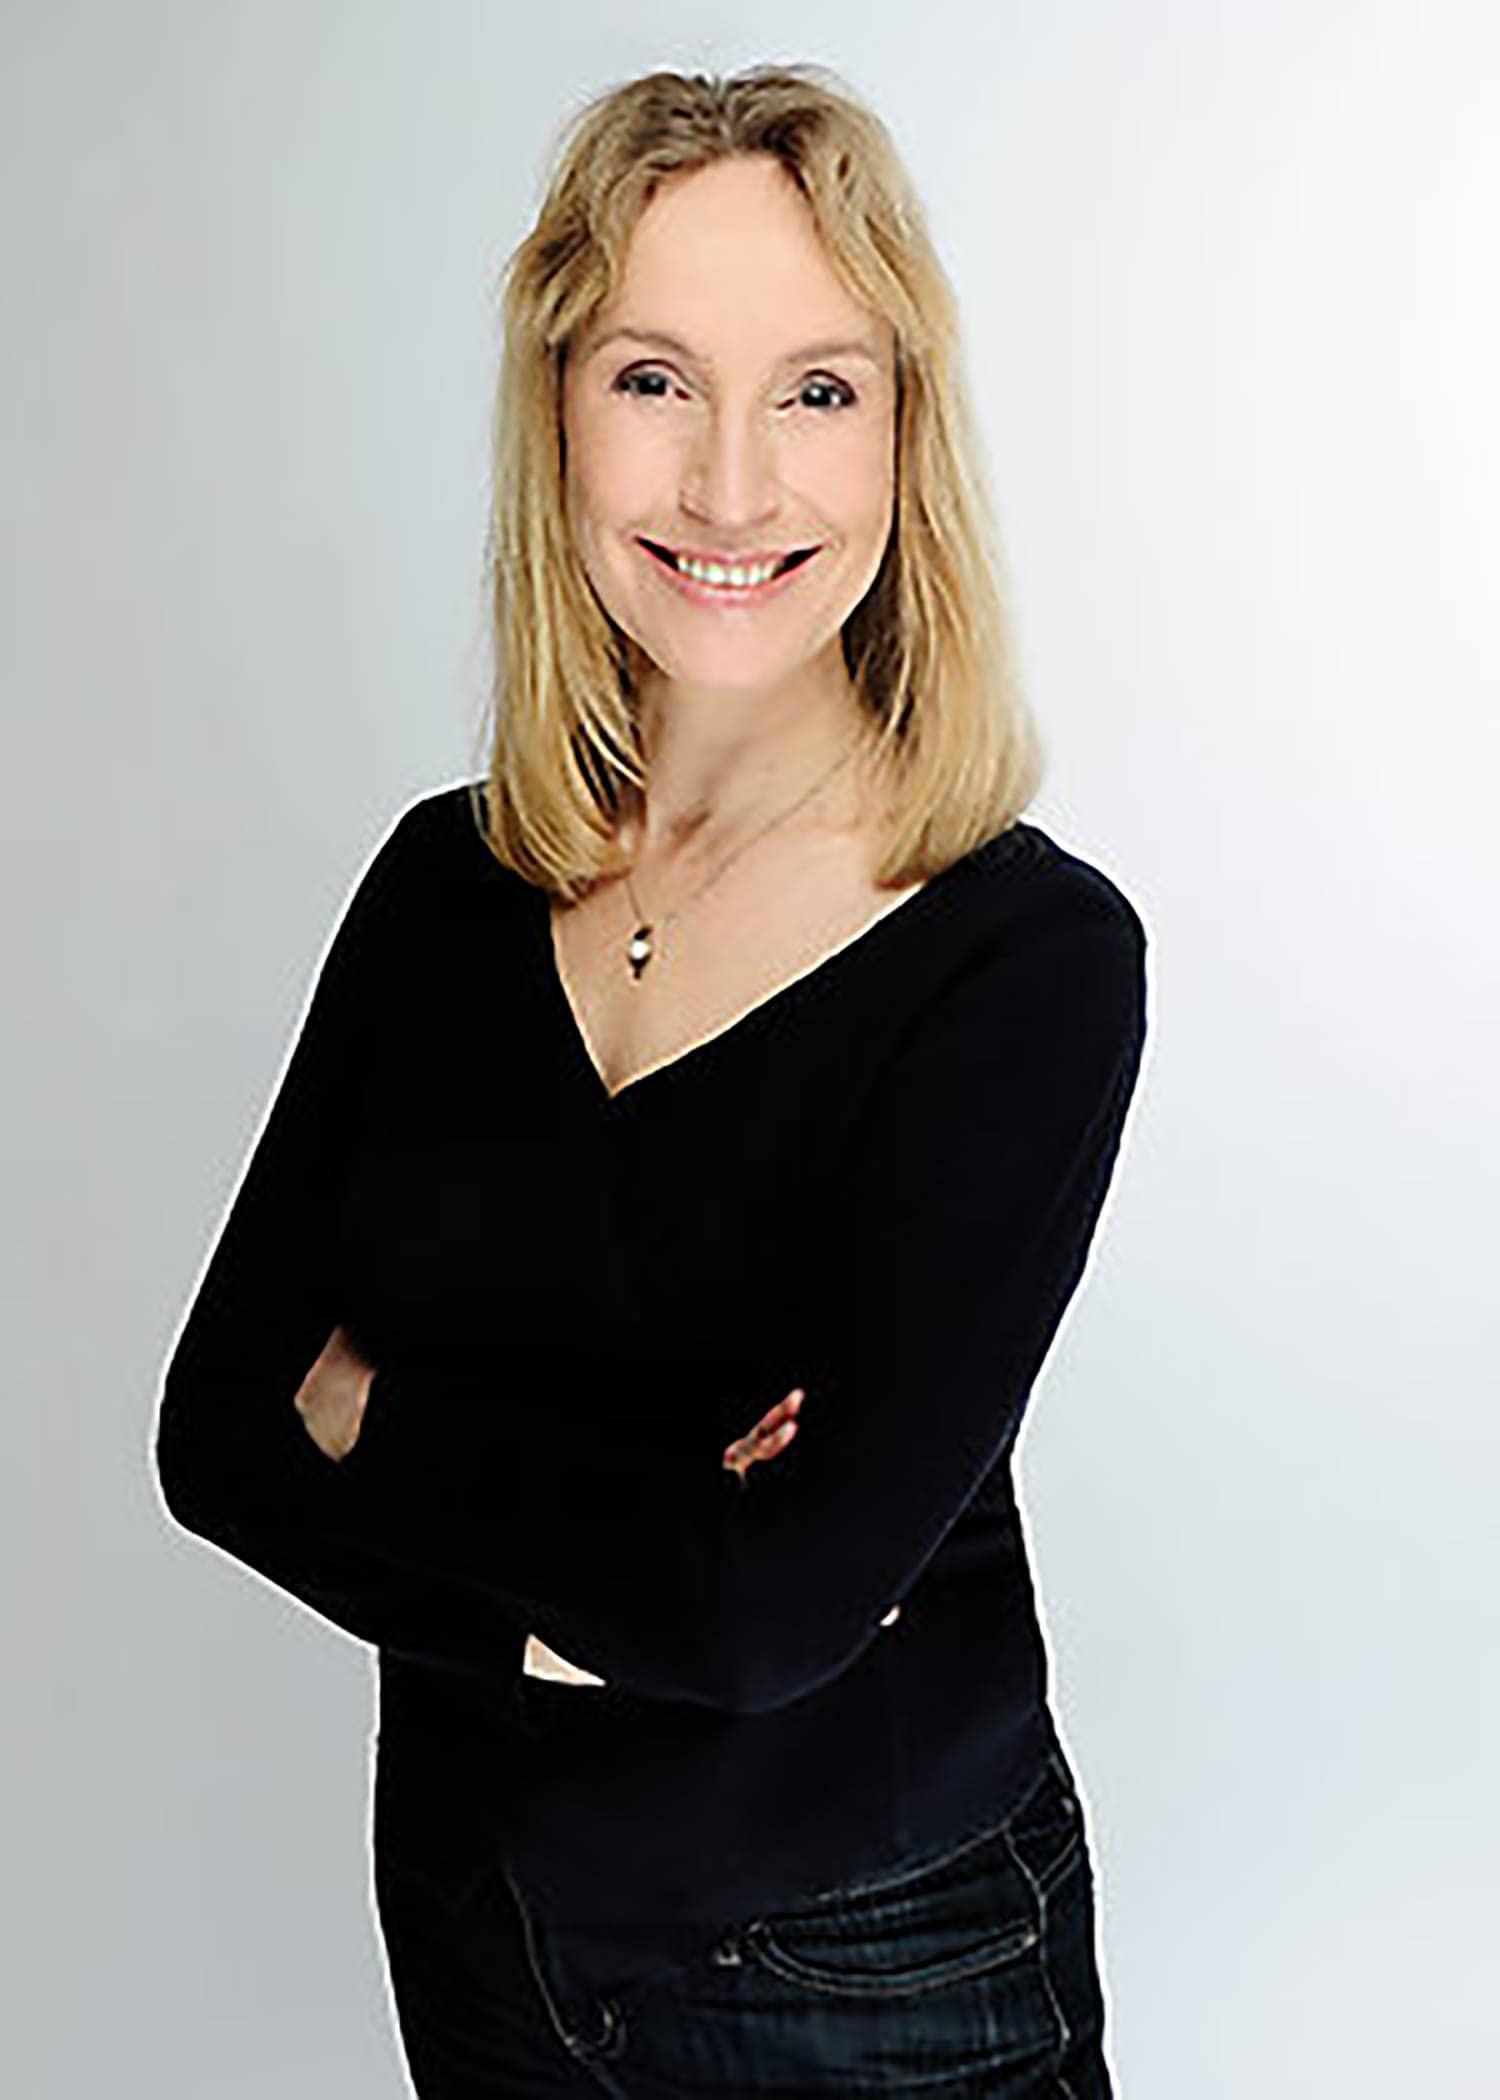 Die Linke - Irmgard Freihoffer (58) Lehrerin Fotos: Linke